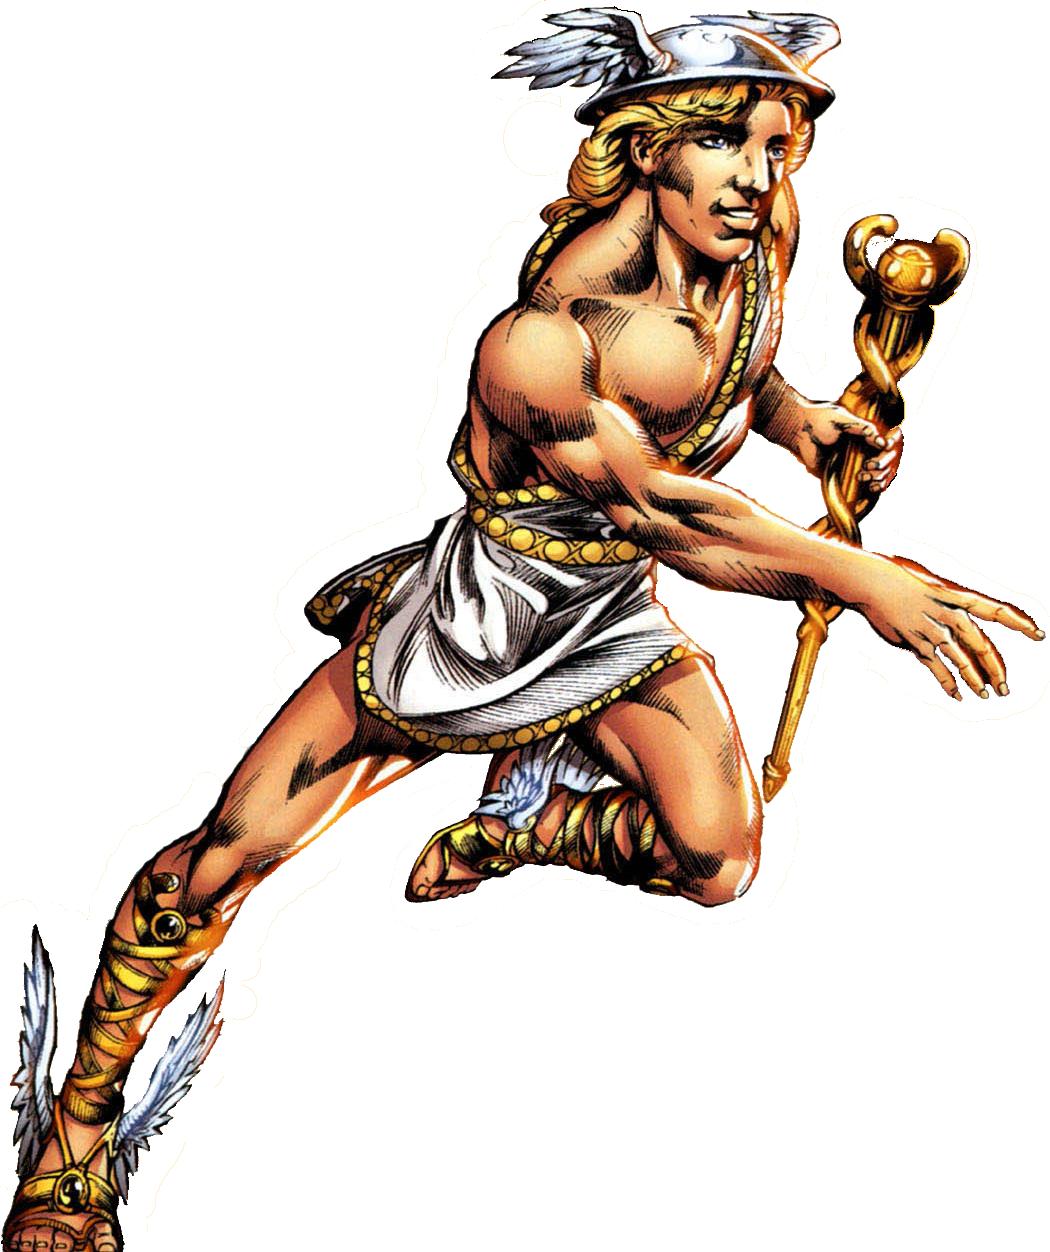 Hermes Diaktoros (Earth-616).png - Hermes PNG